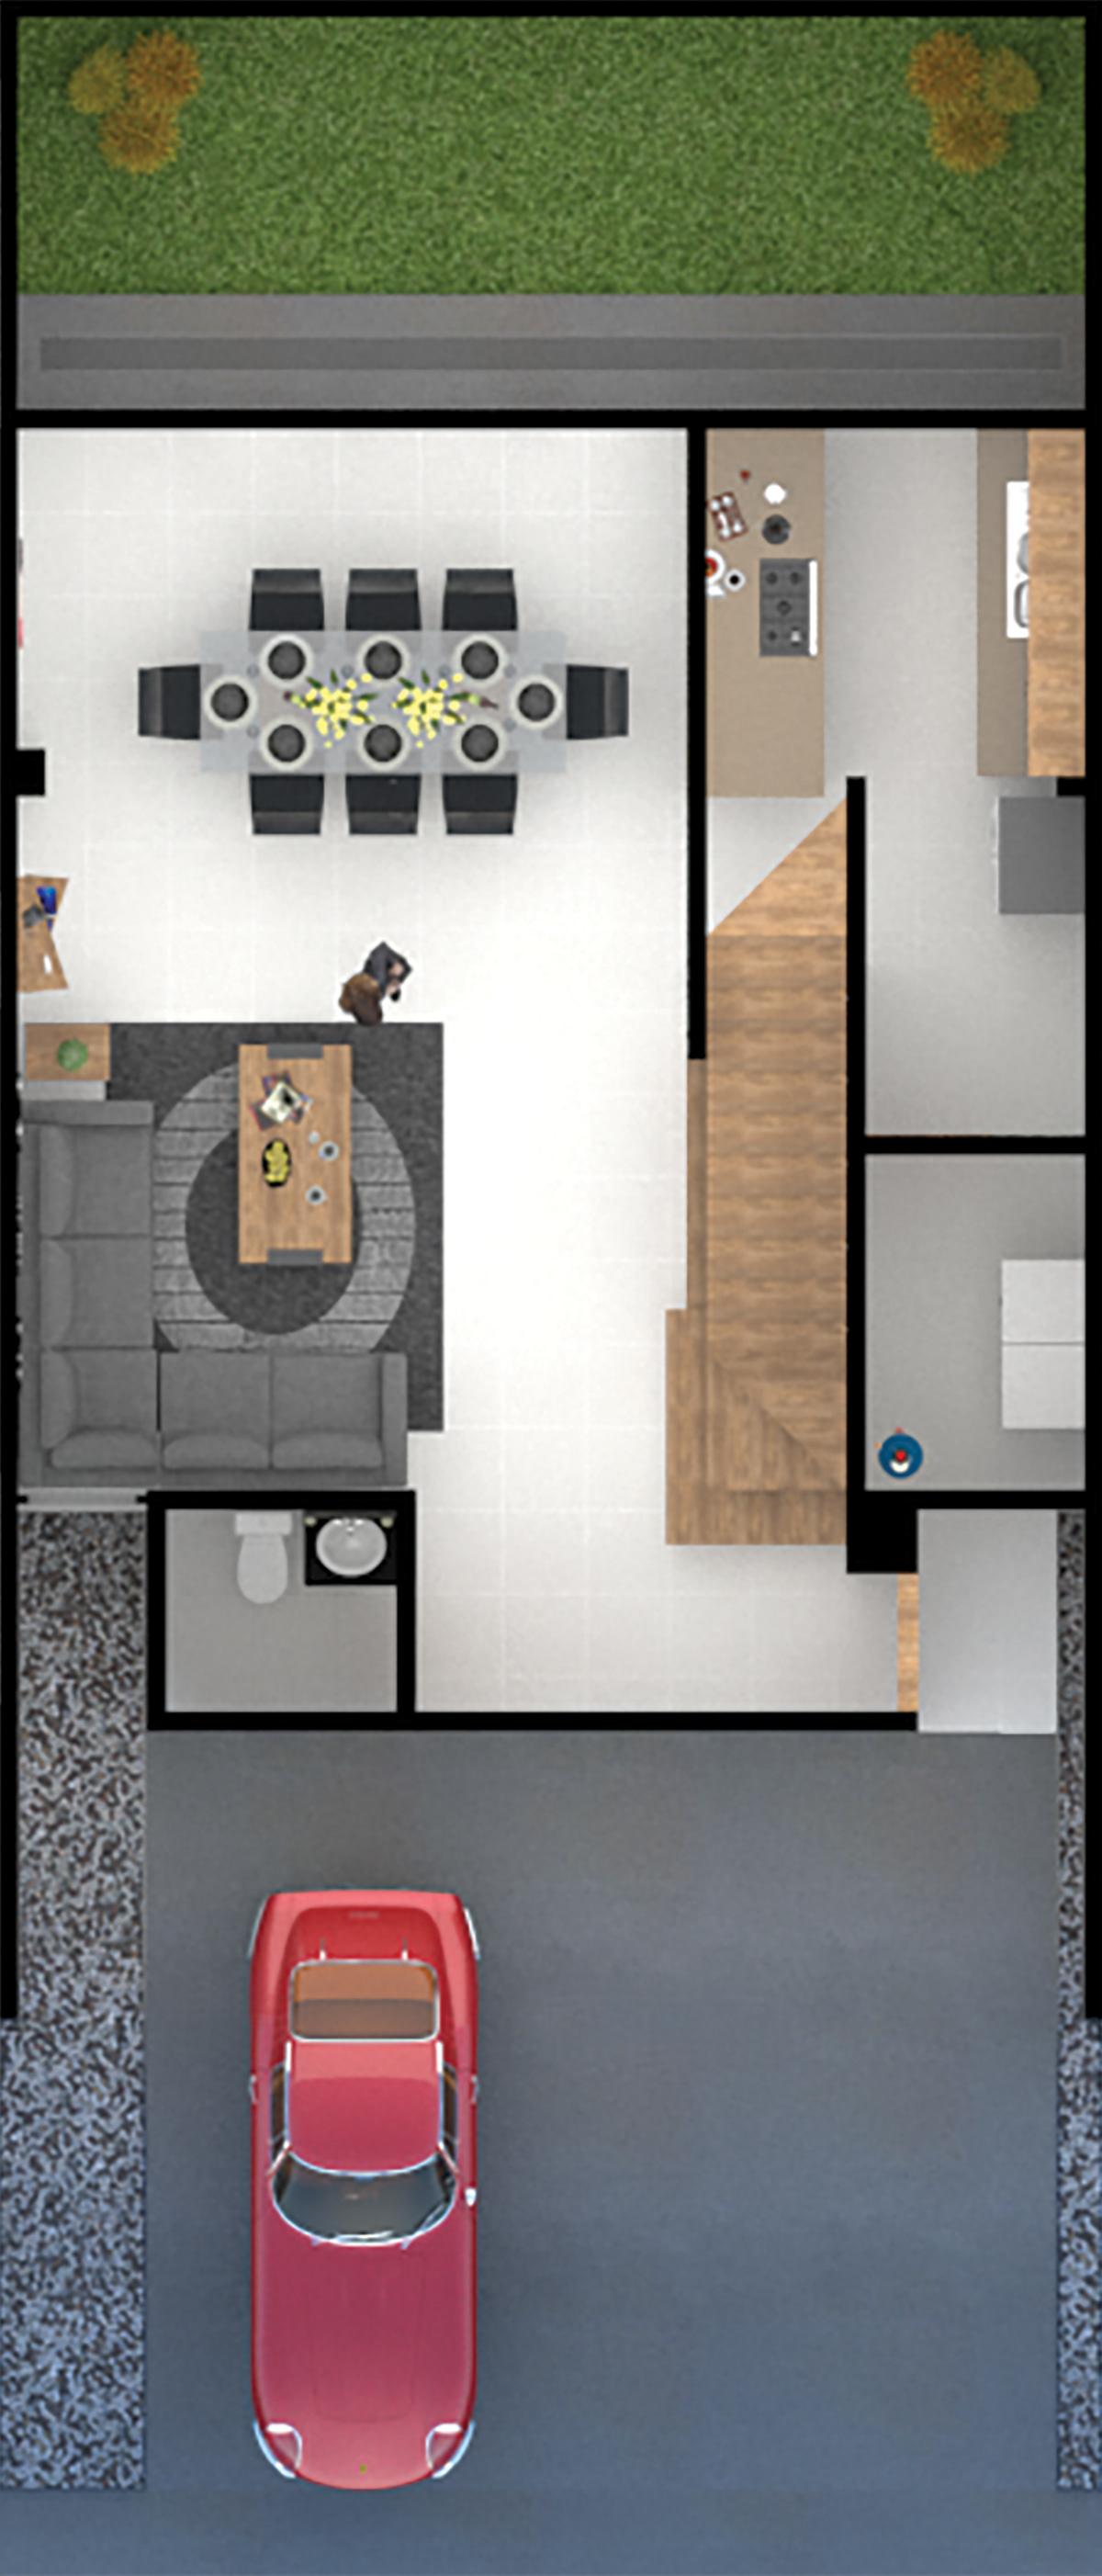 Image may contain: screenshot, indoor and cartoon